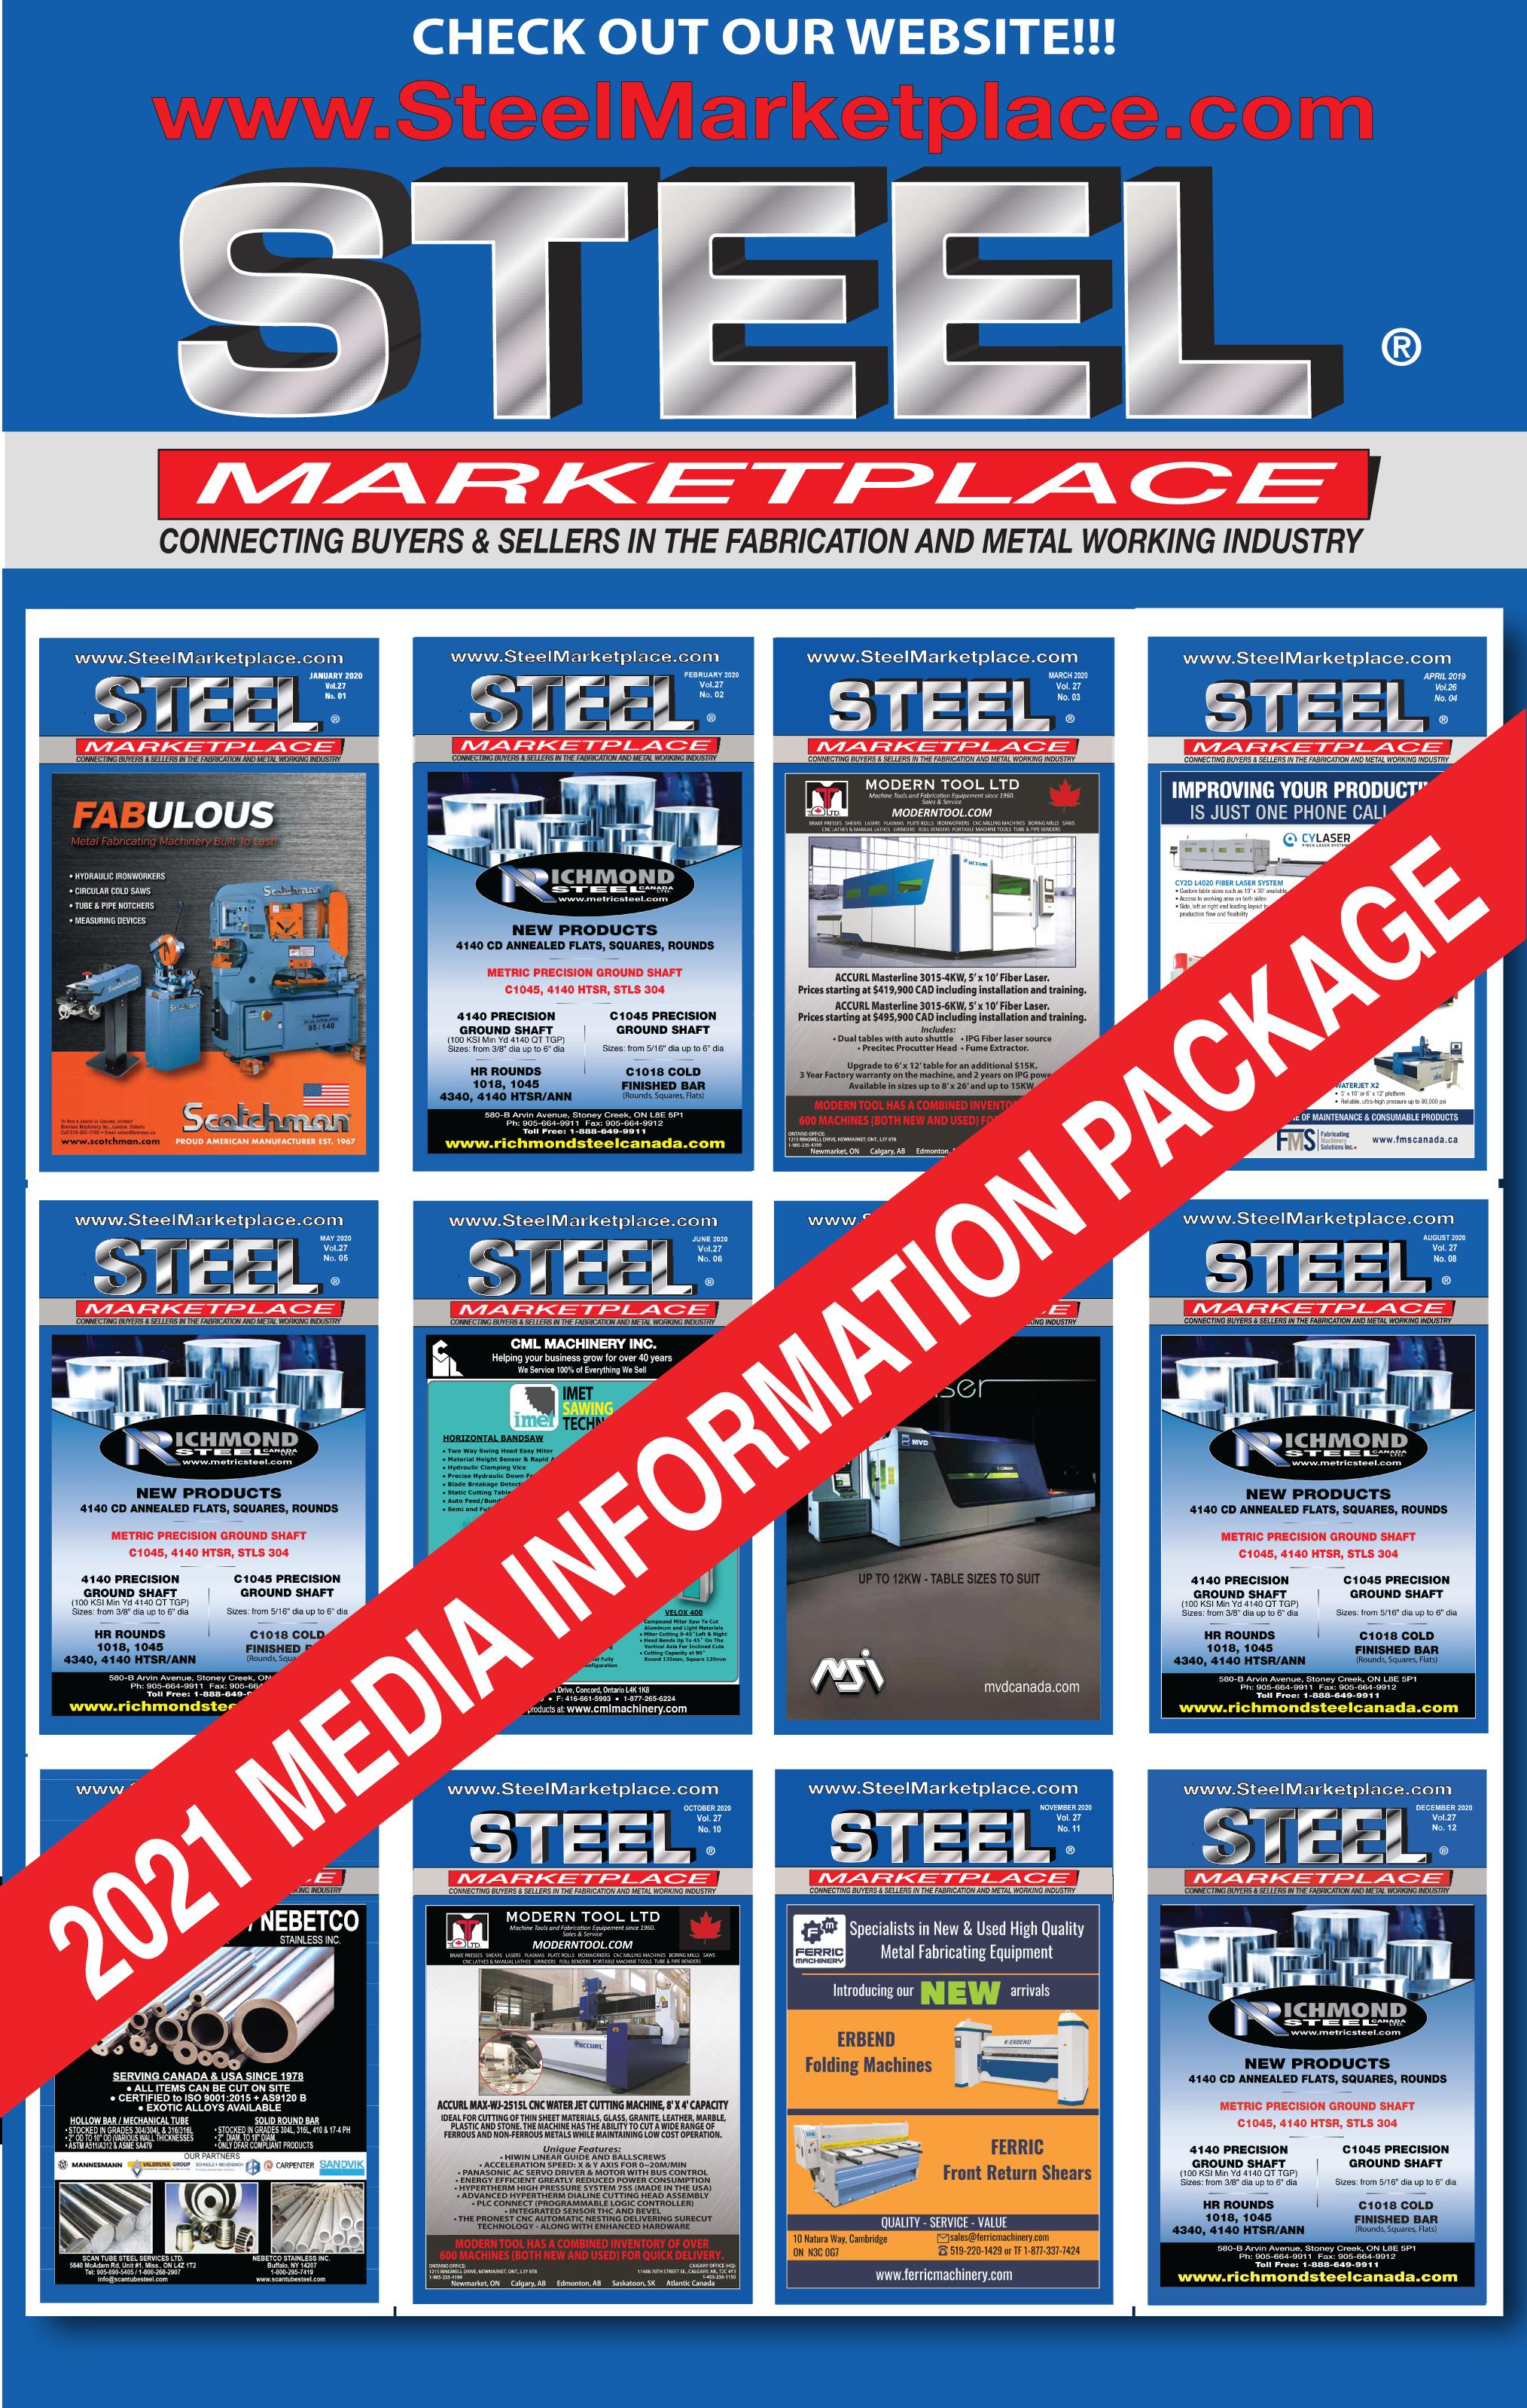 Media Information Kit